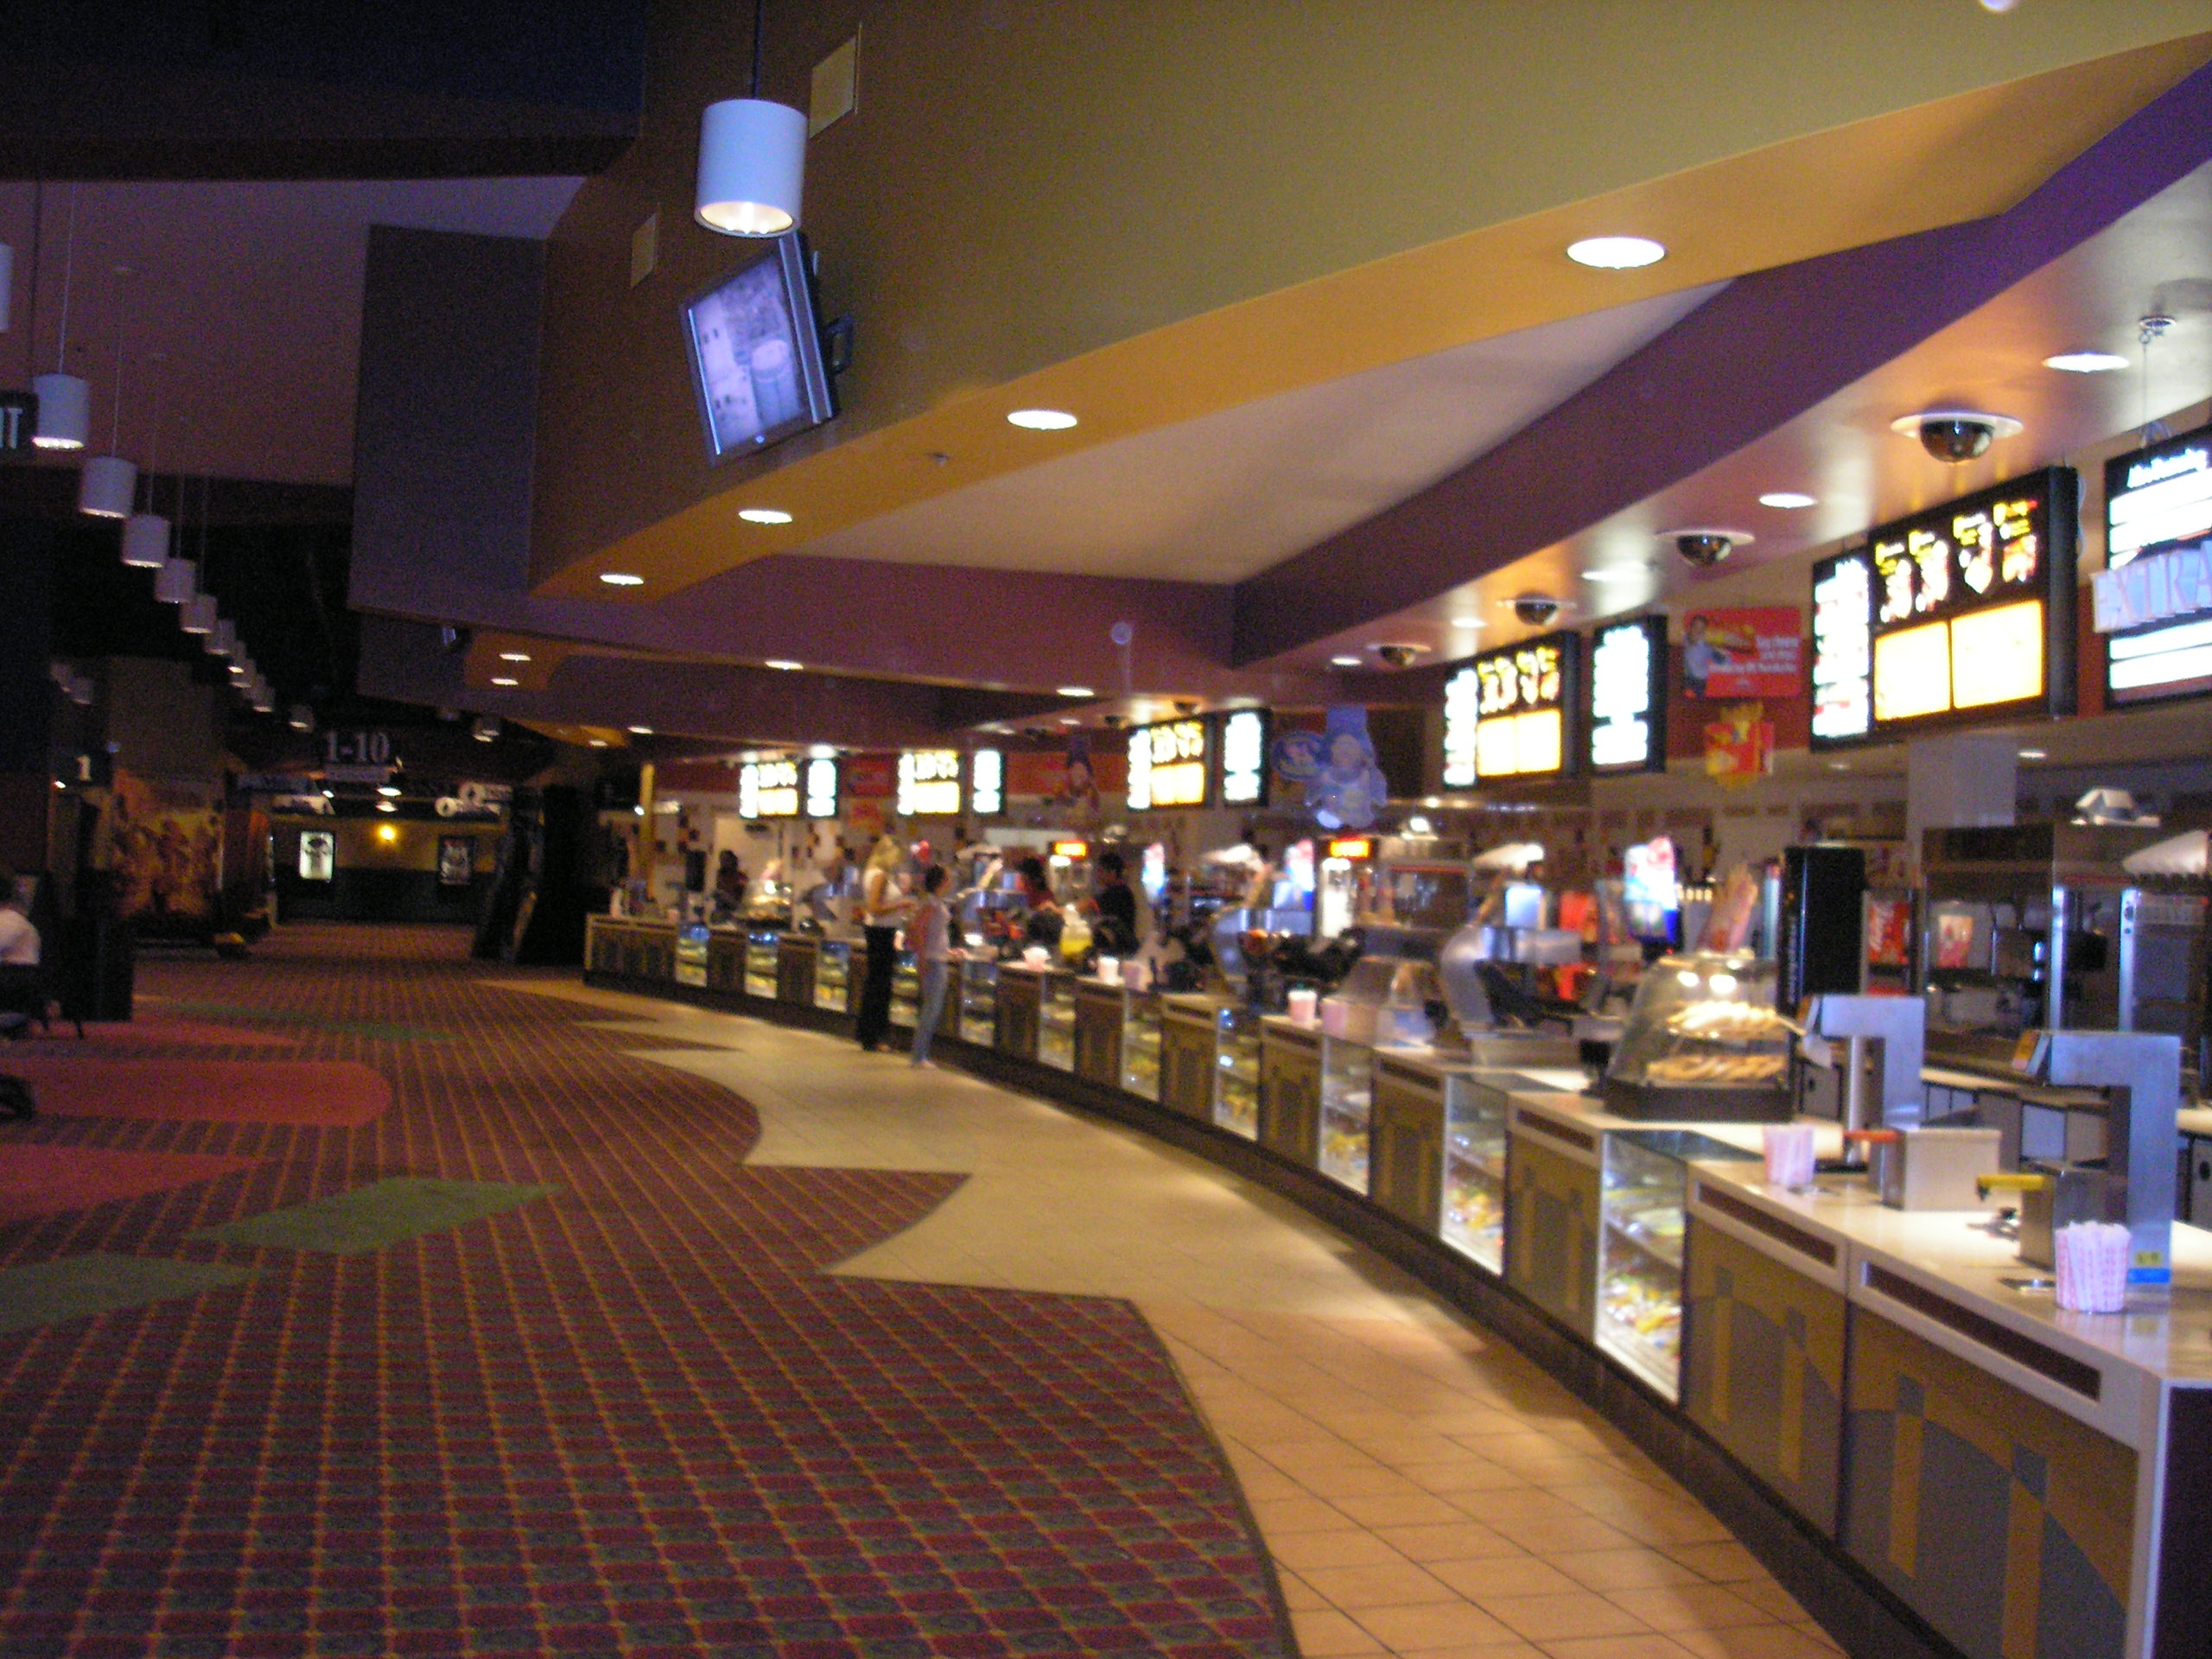 Amc movie cinema - Recent Wholesale